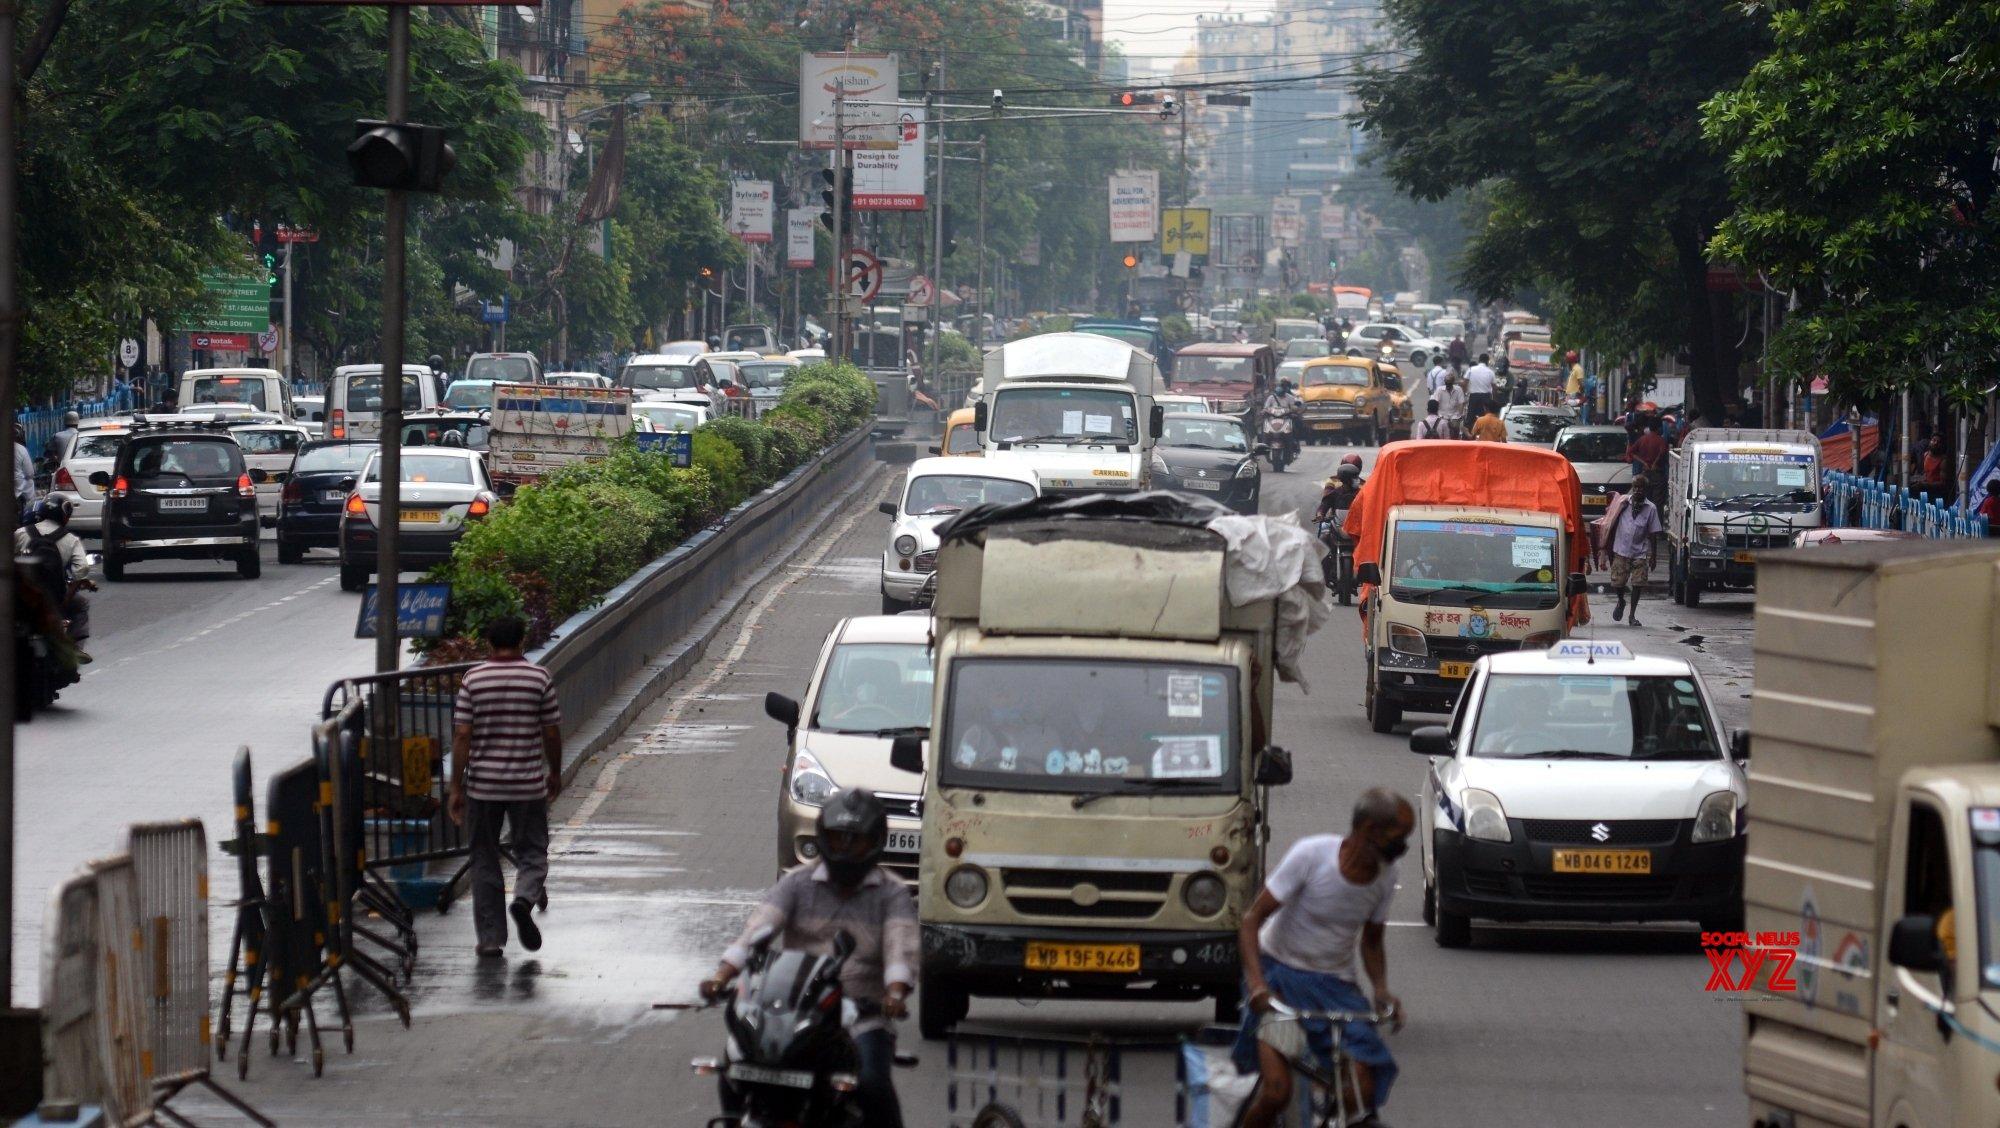 Kolkata: Ignoring the lockdown, lots of vehicles are running on roads during lockdown on Coronavirus pandemic - in Kolkata. #Gallery